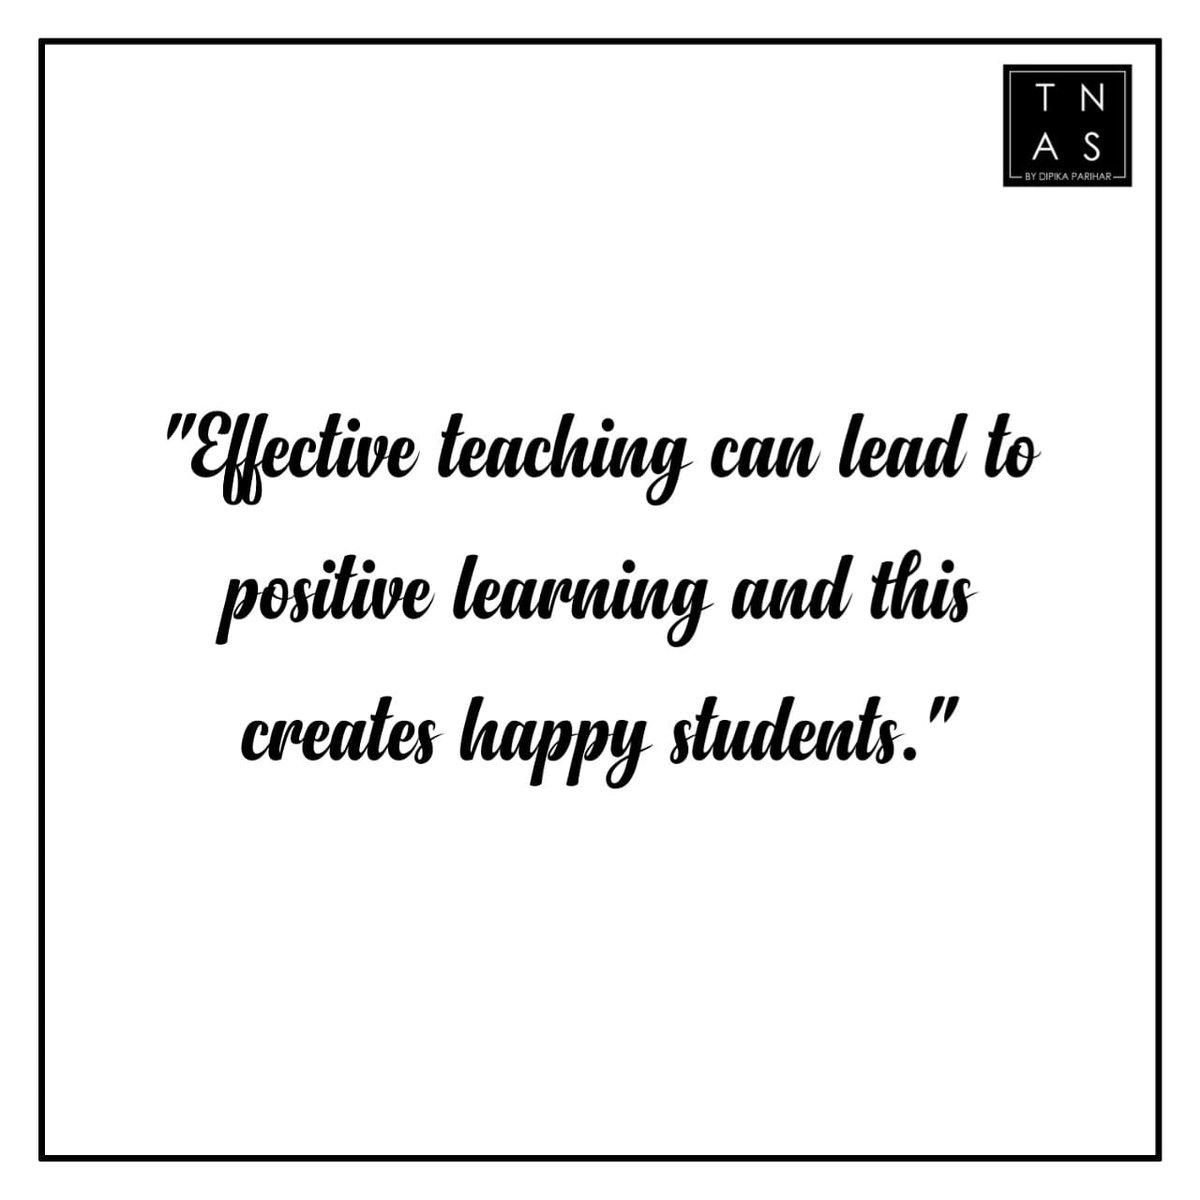 """The students if taught with curiosity can continue the learning process as long as they live.""  Academy at - Mumbai   Bengaluru   Kolkata  #TheNailArtSchool #NailArt #NailArtist #Nailsofinstagram #NailLovers #Nails #Nailssalon #Nailspofessional #Nailsdesigns #Learn #Learnnailartpic.twitter.com/V6cz6RwKsl"